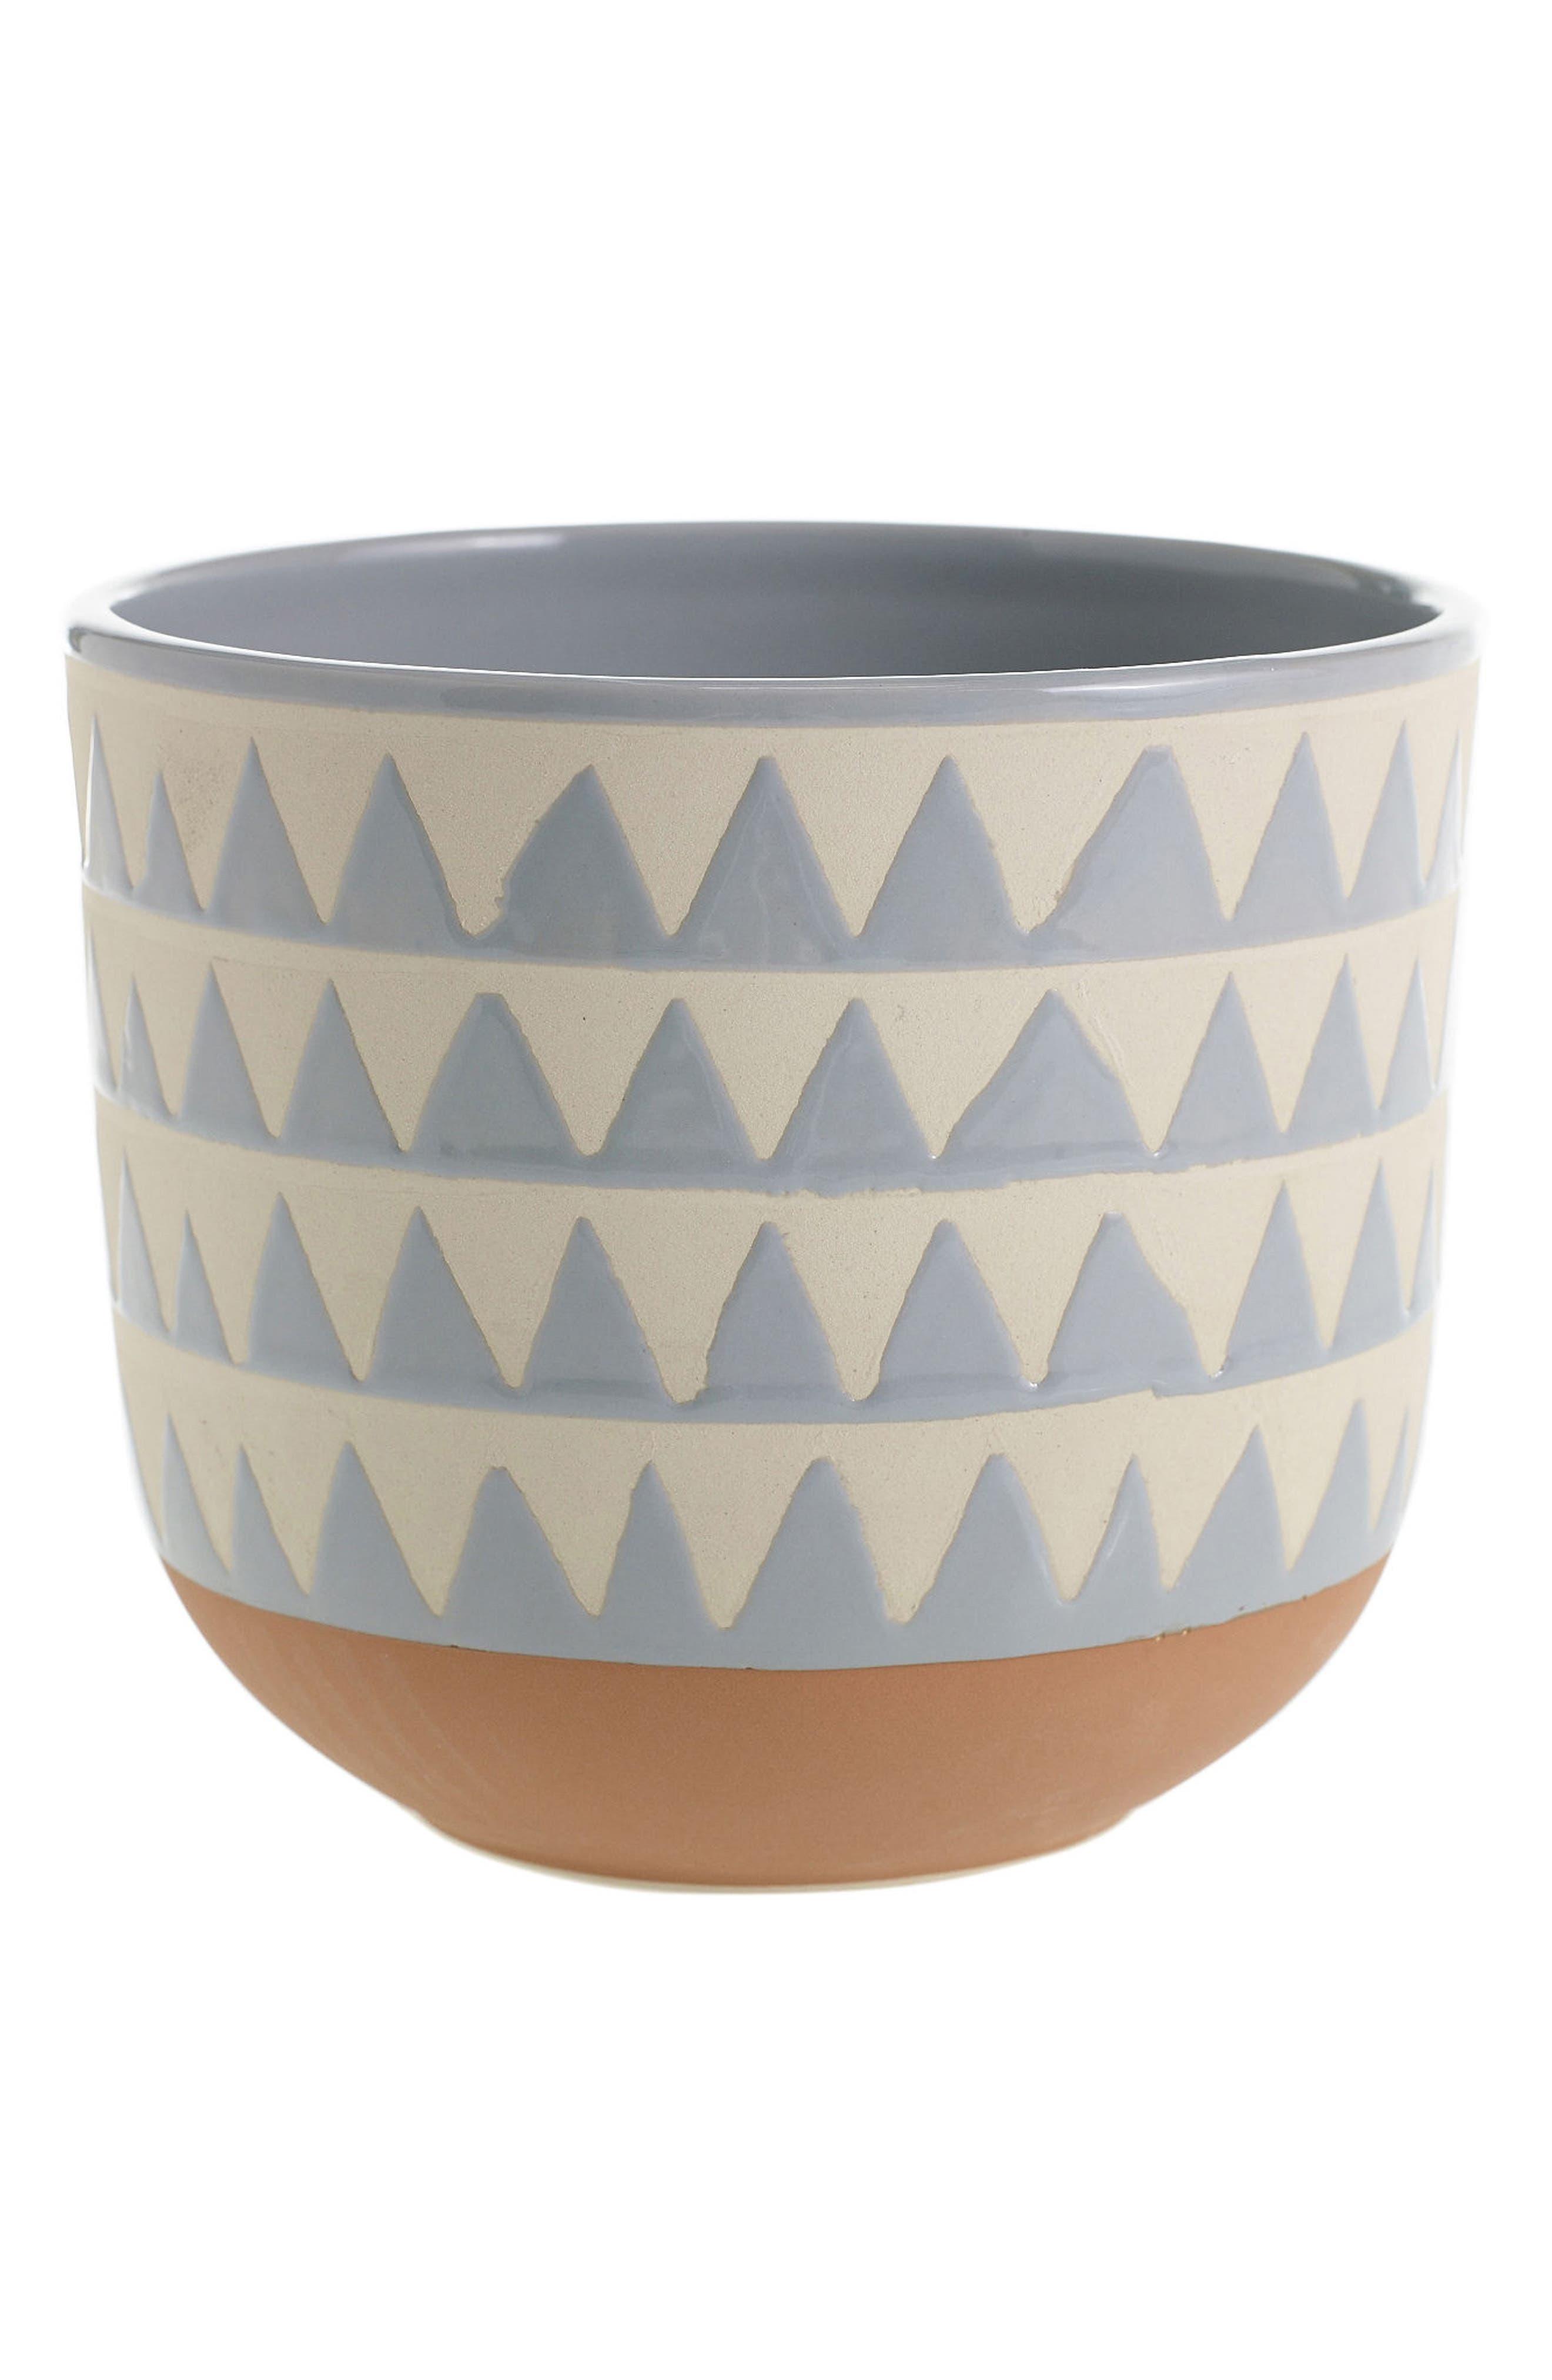 Sully Ceramic Pot,                             Main thumbnail 1, color,